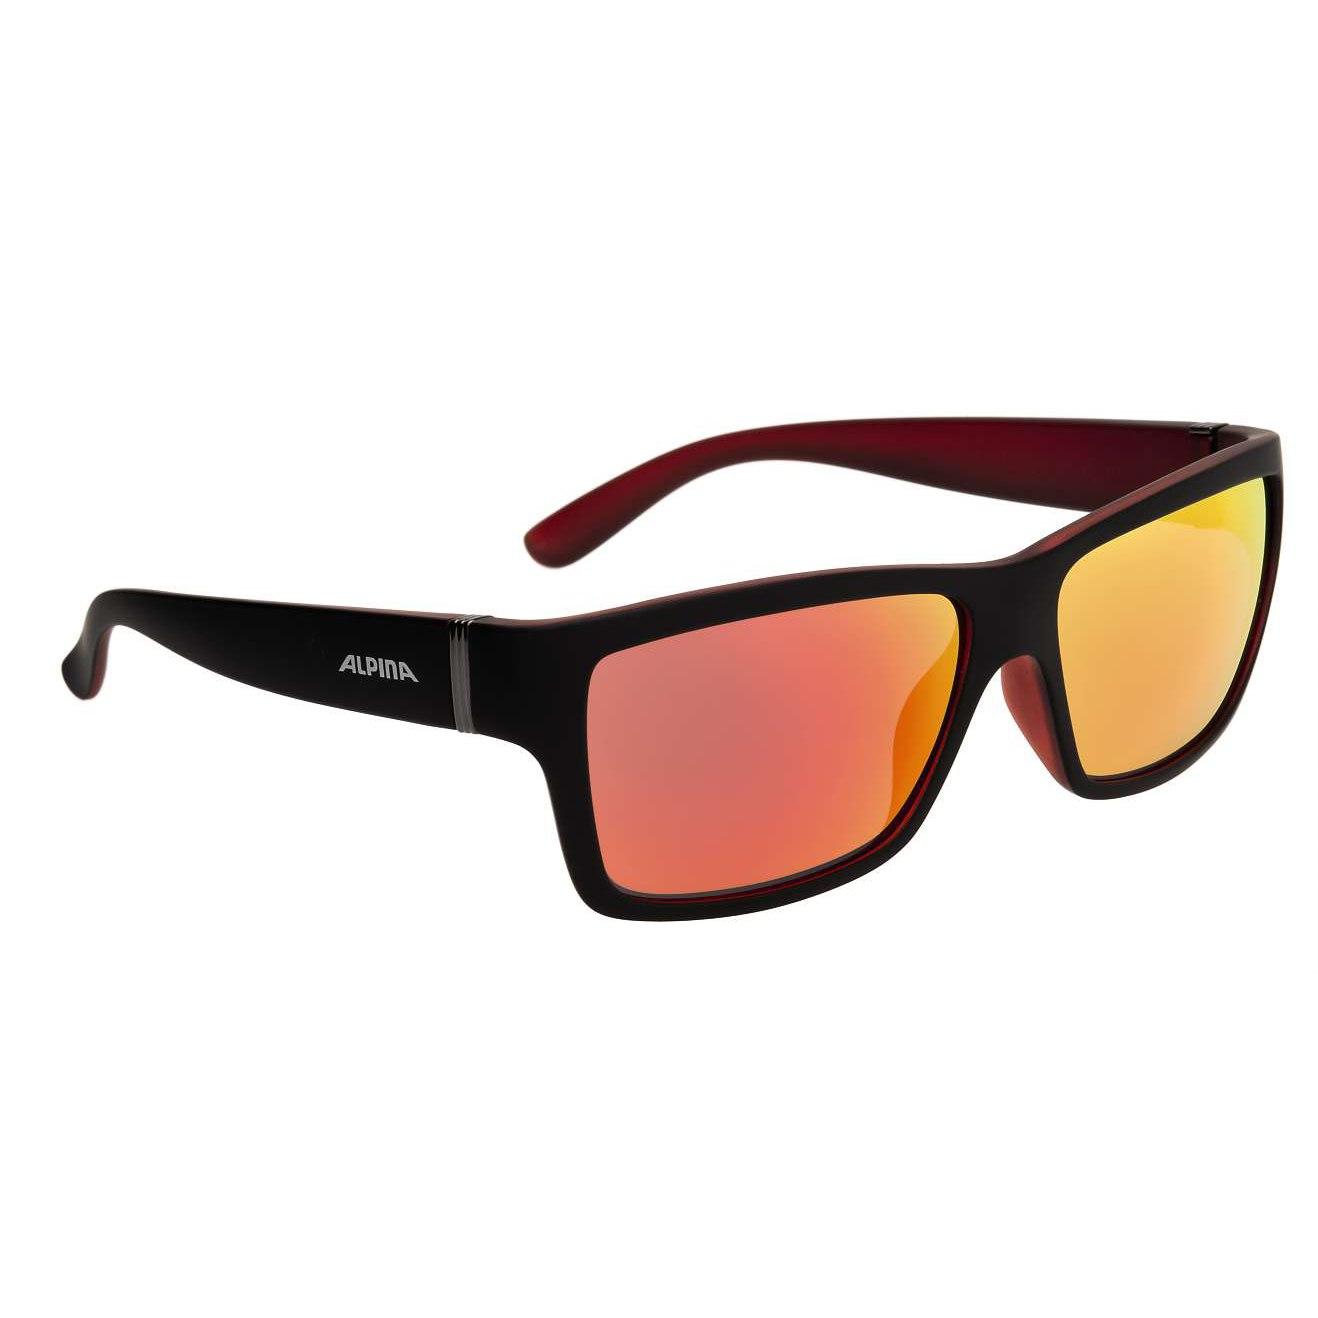 Alpina Kacey Glasses - Black Matt-Red/CeramiC Mirror Red